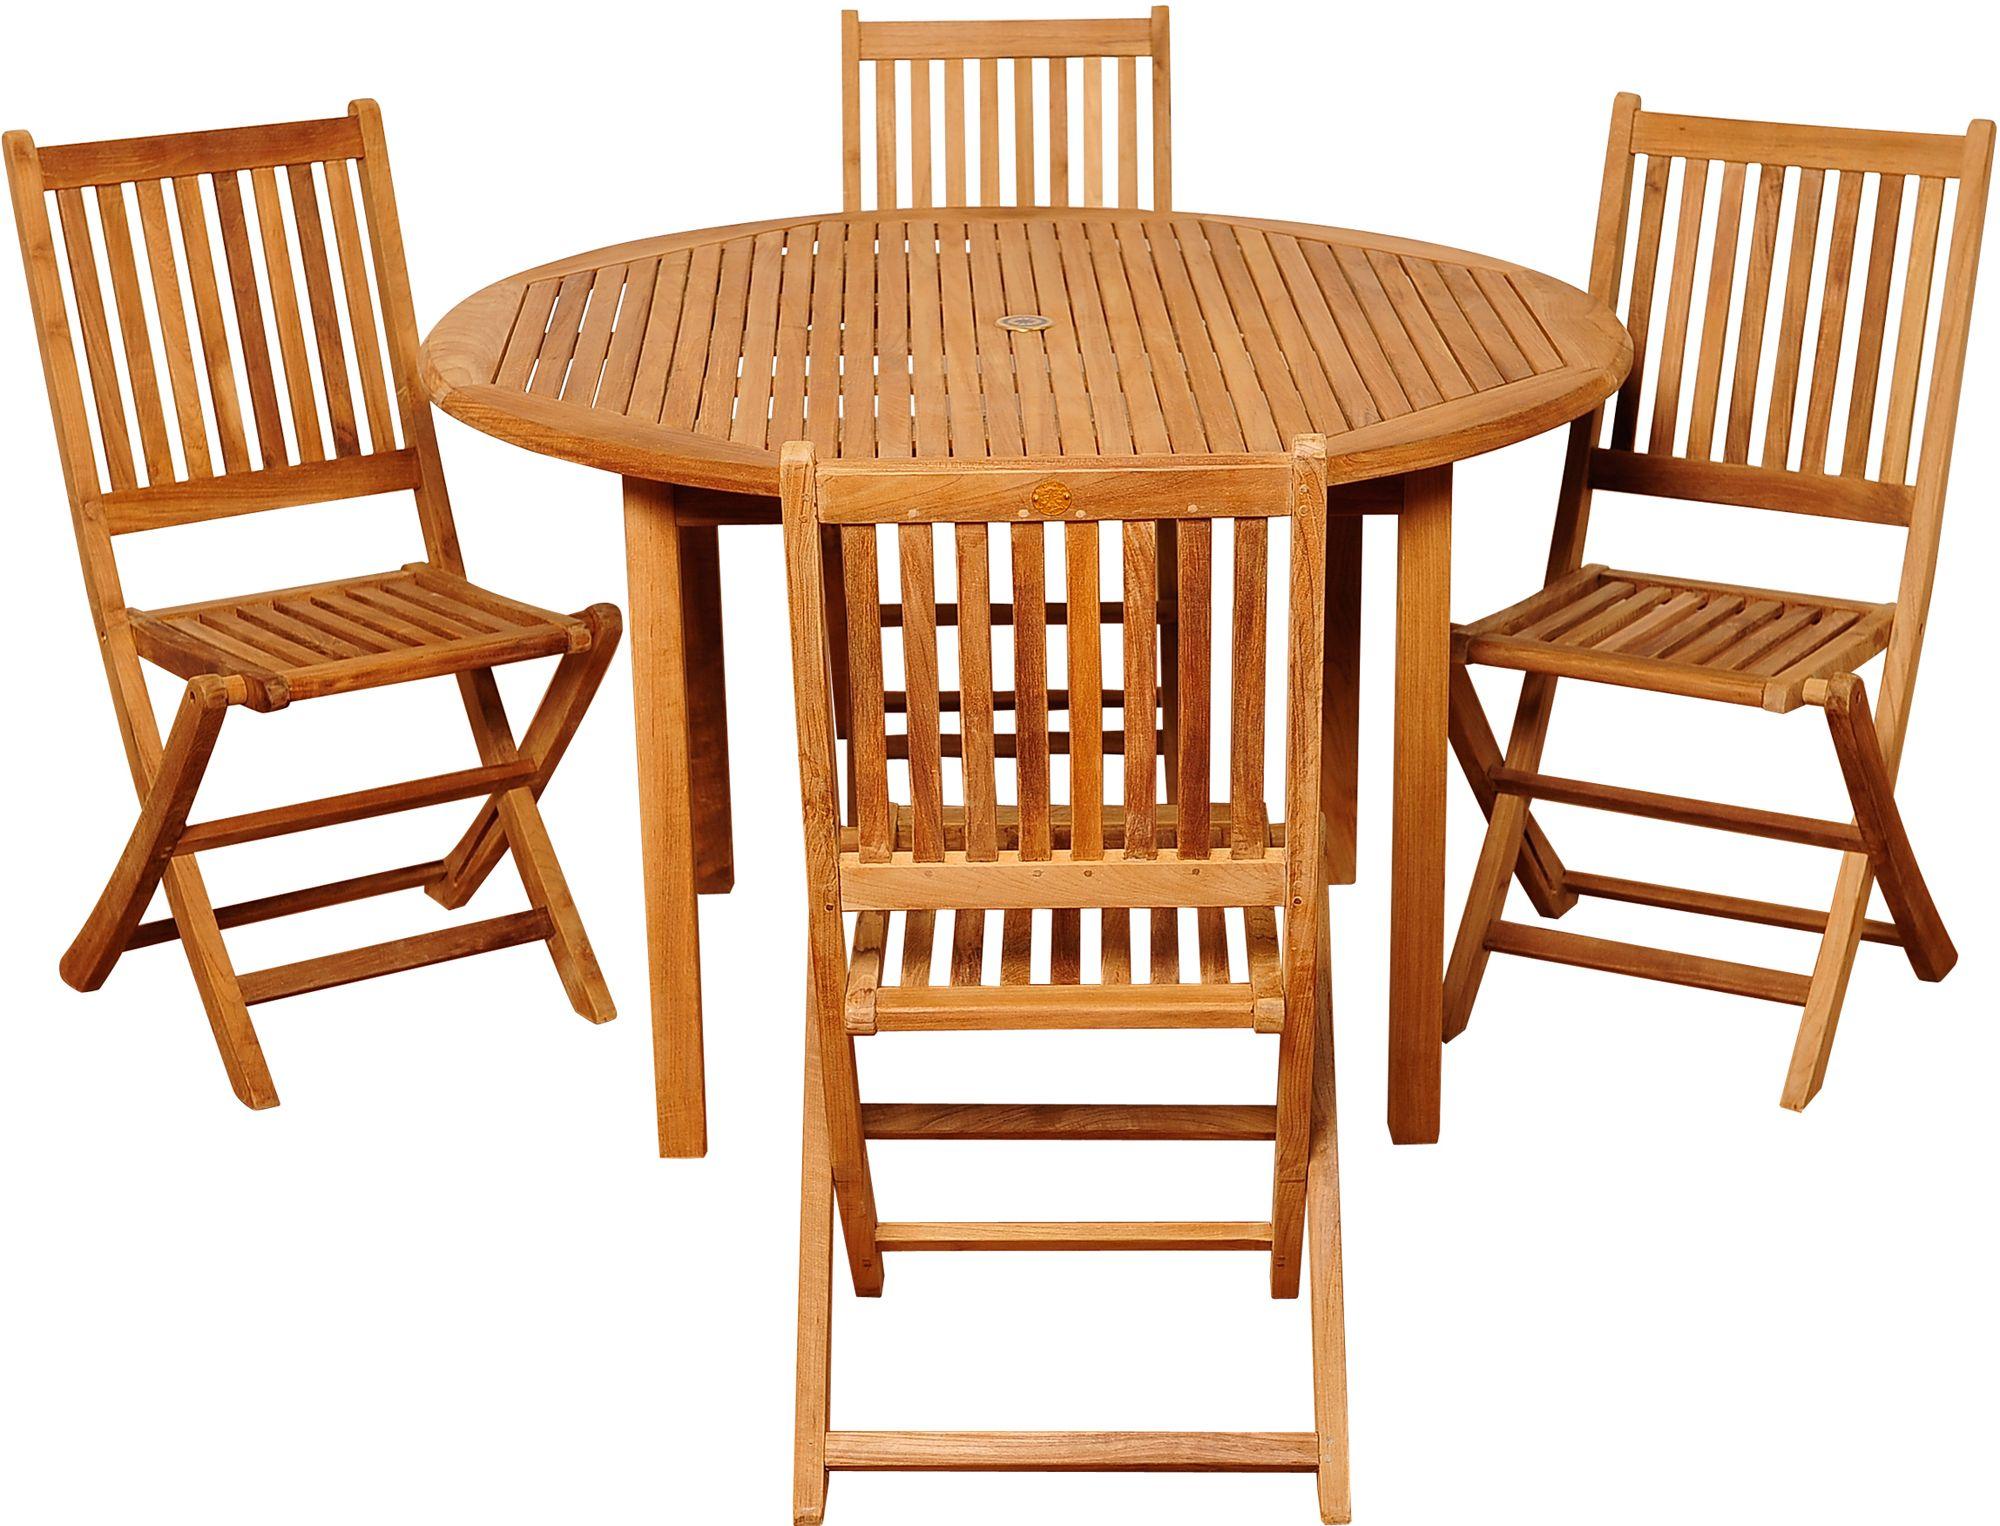 dallis teak folding chair 5 piece round patio dining set